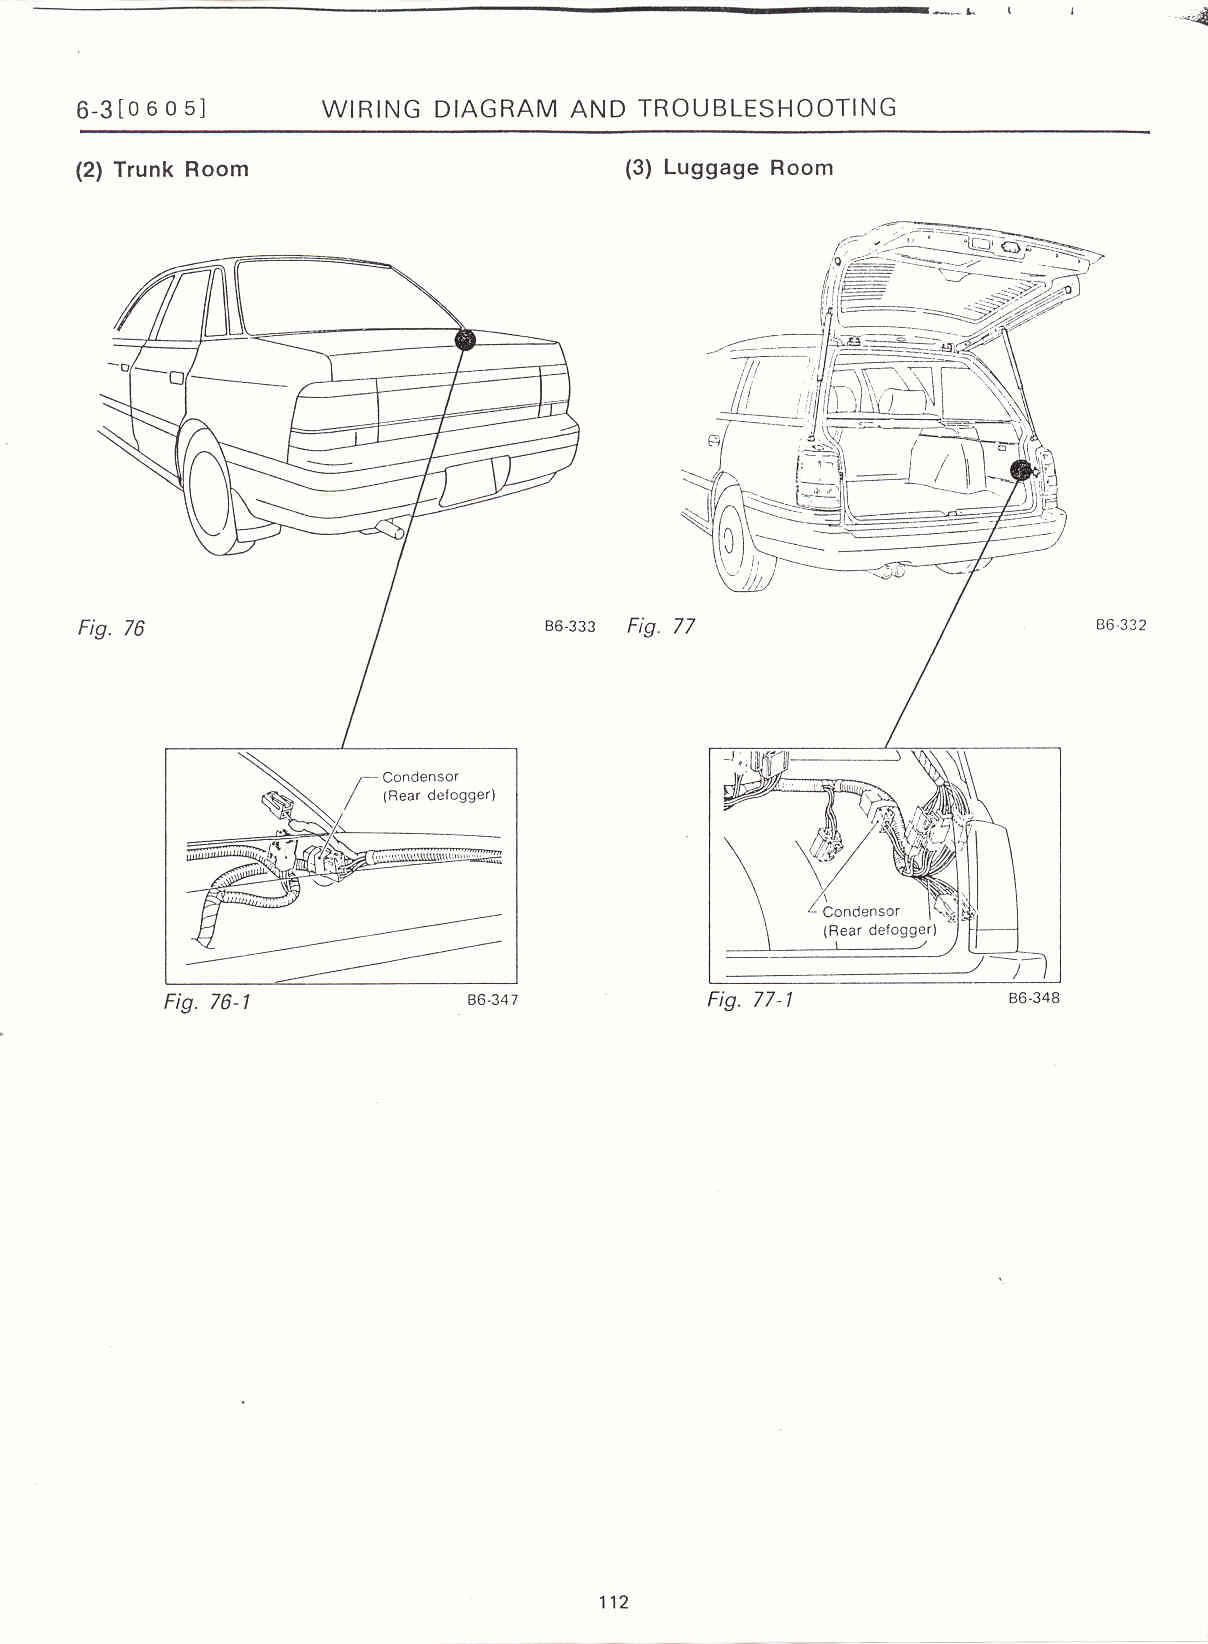 94 Mitsubishi Mirage Fuse Box Wiring Diagram Will Be A Thing Harness Subaru Legacy Transmission Solenoid Imageresizertool Com 1994